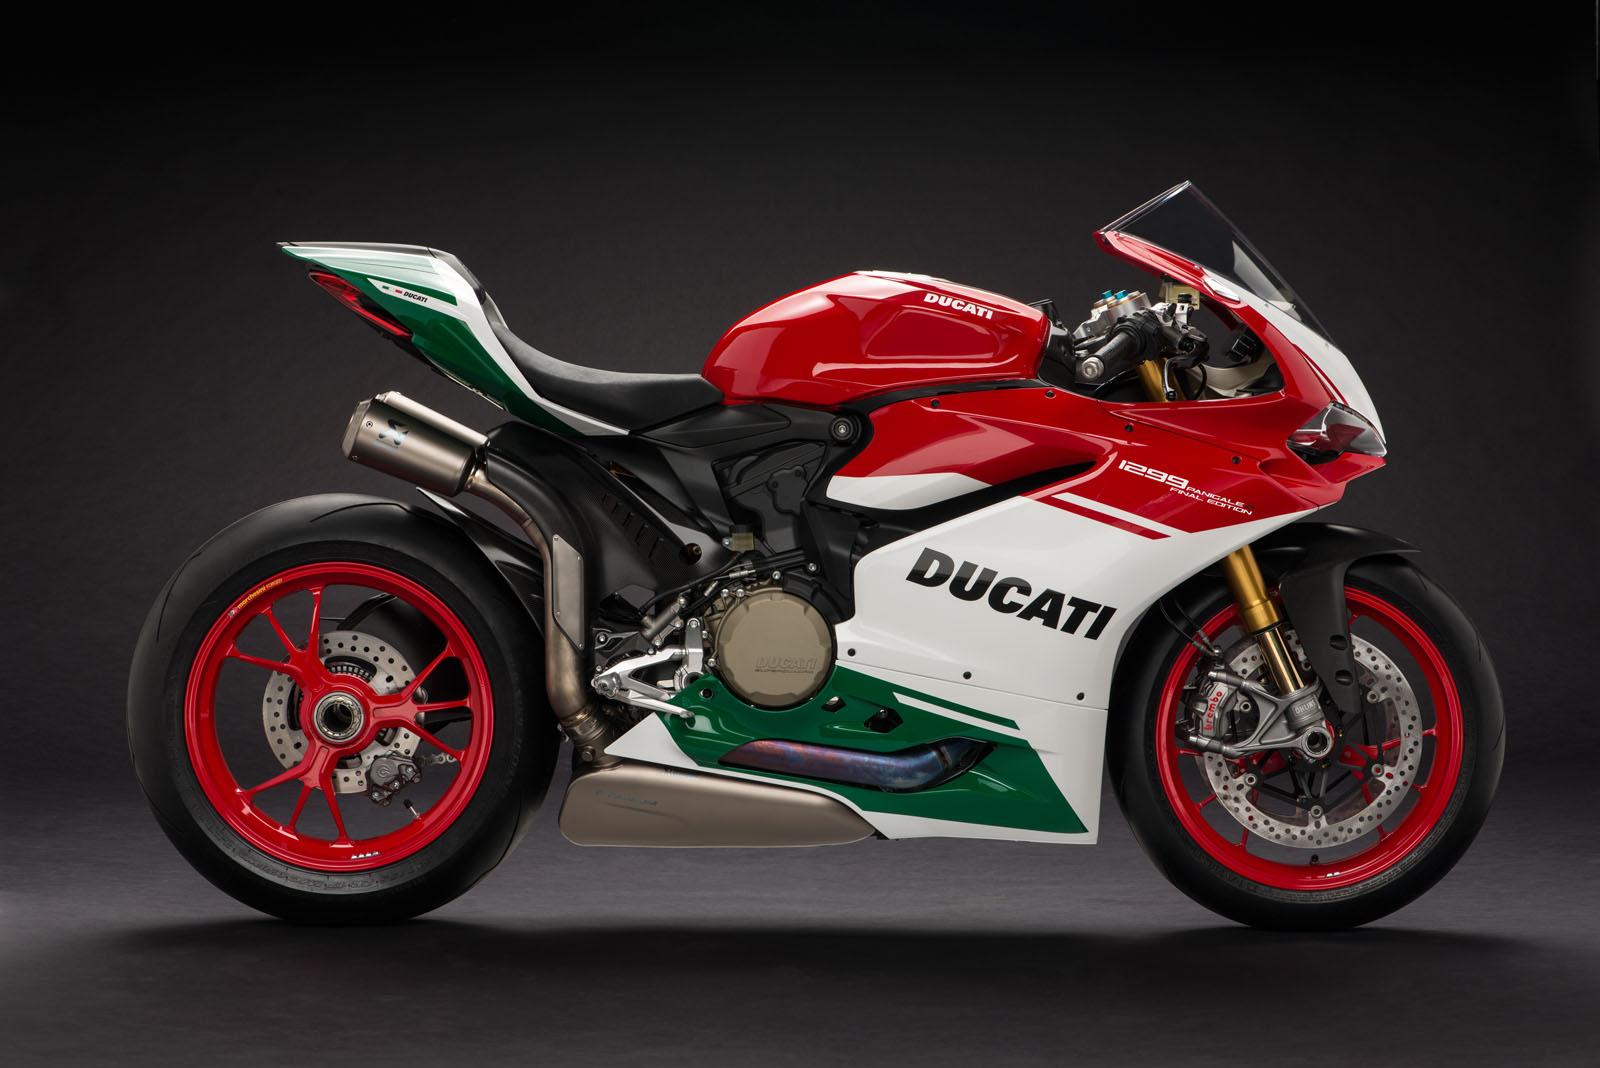 Precios del Ducati Panigale R Final Edition